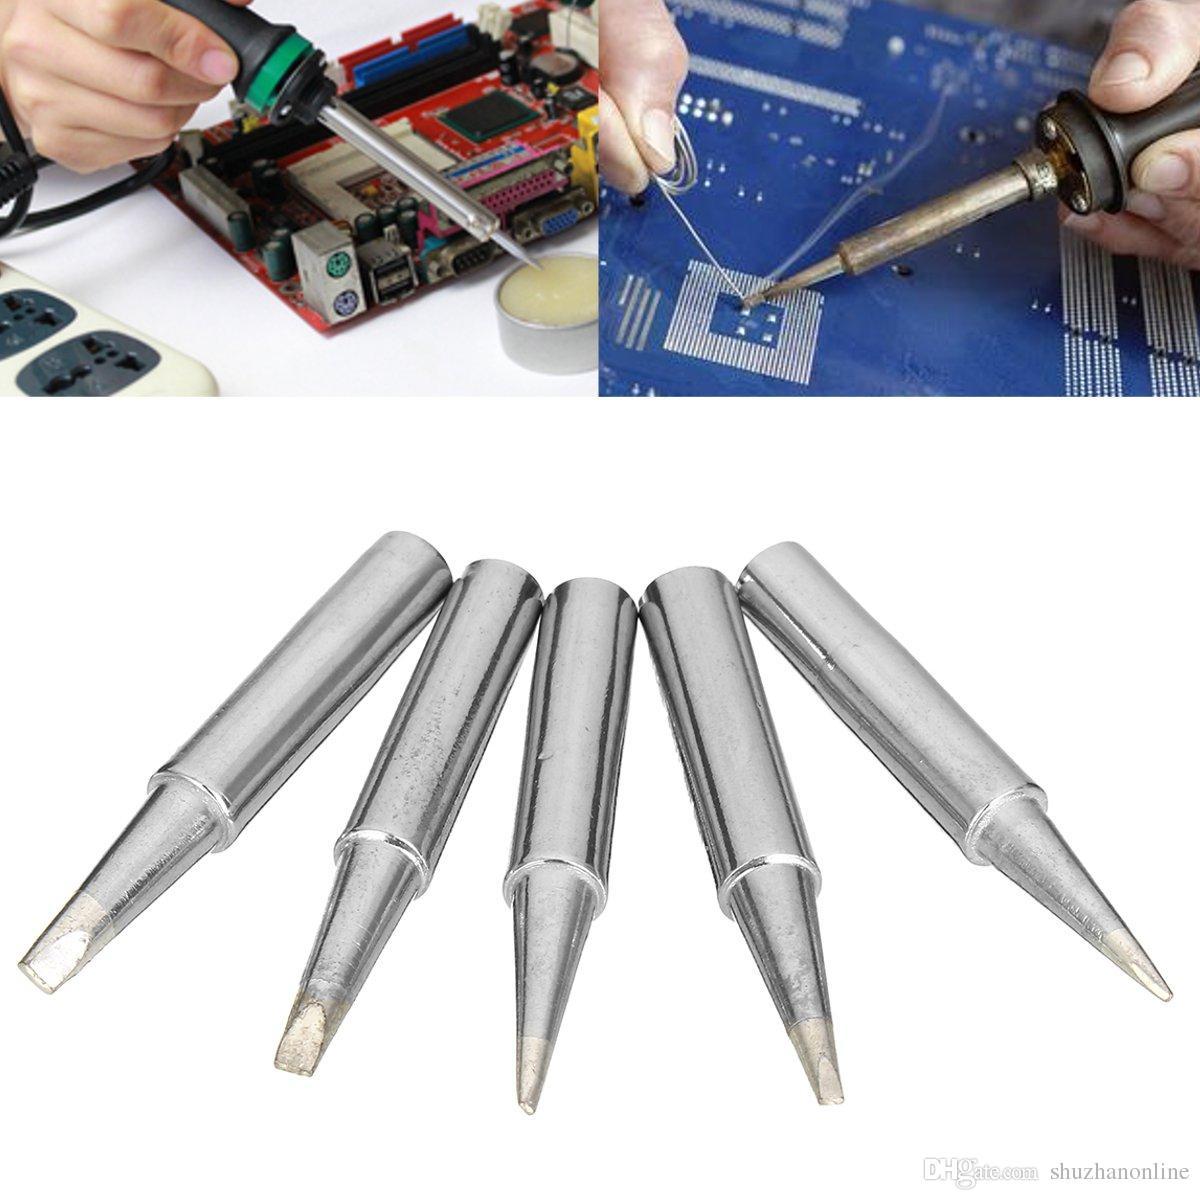 5PCS Solder Iron Tip 900M-T-0.8D For Hakko Soldering Rework Station Tool